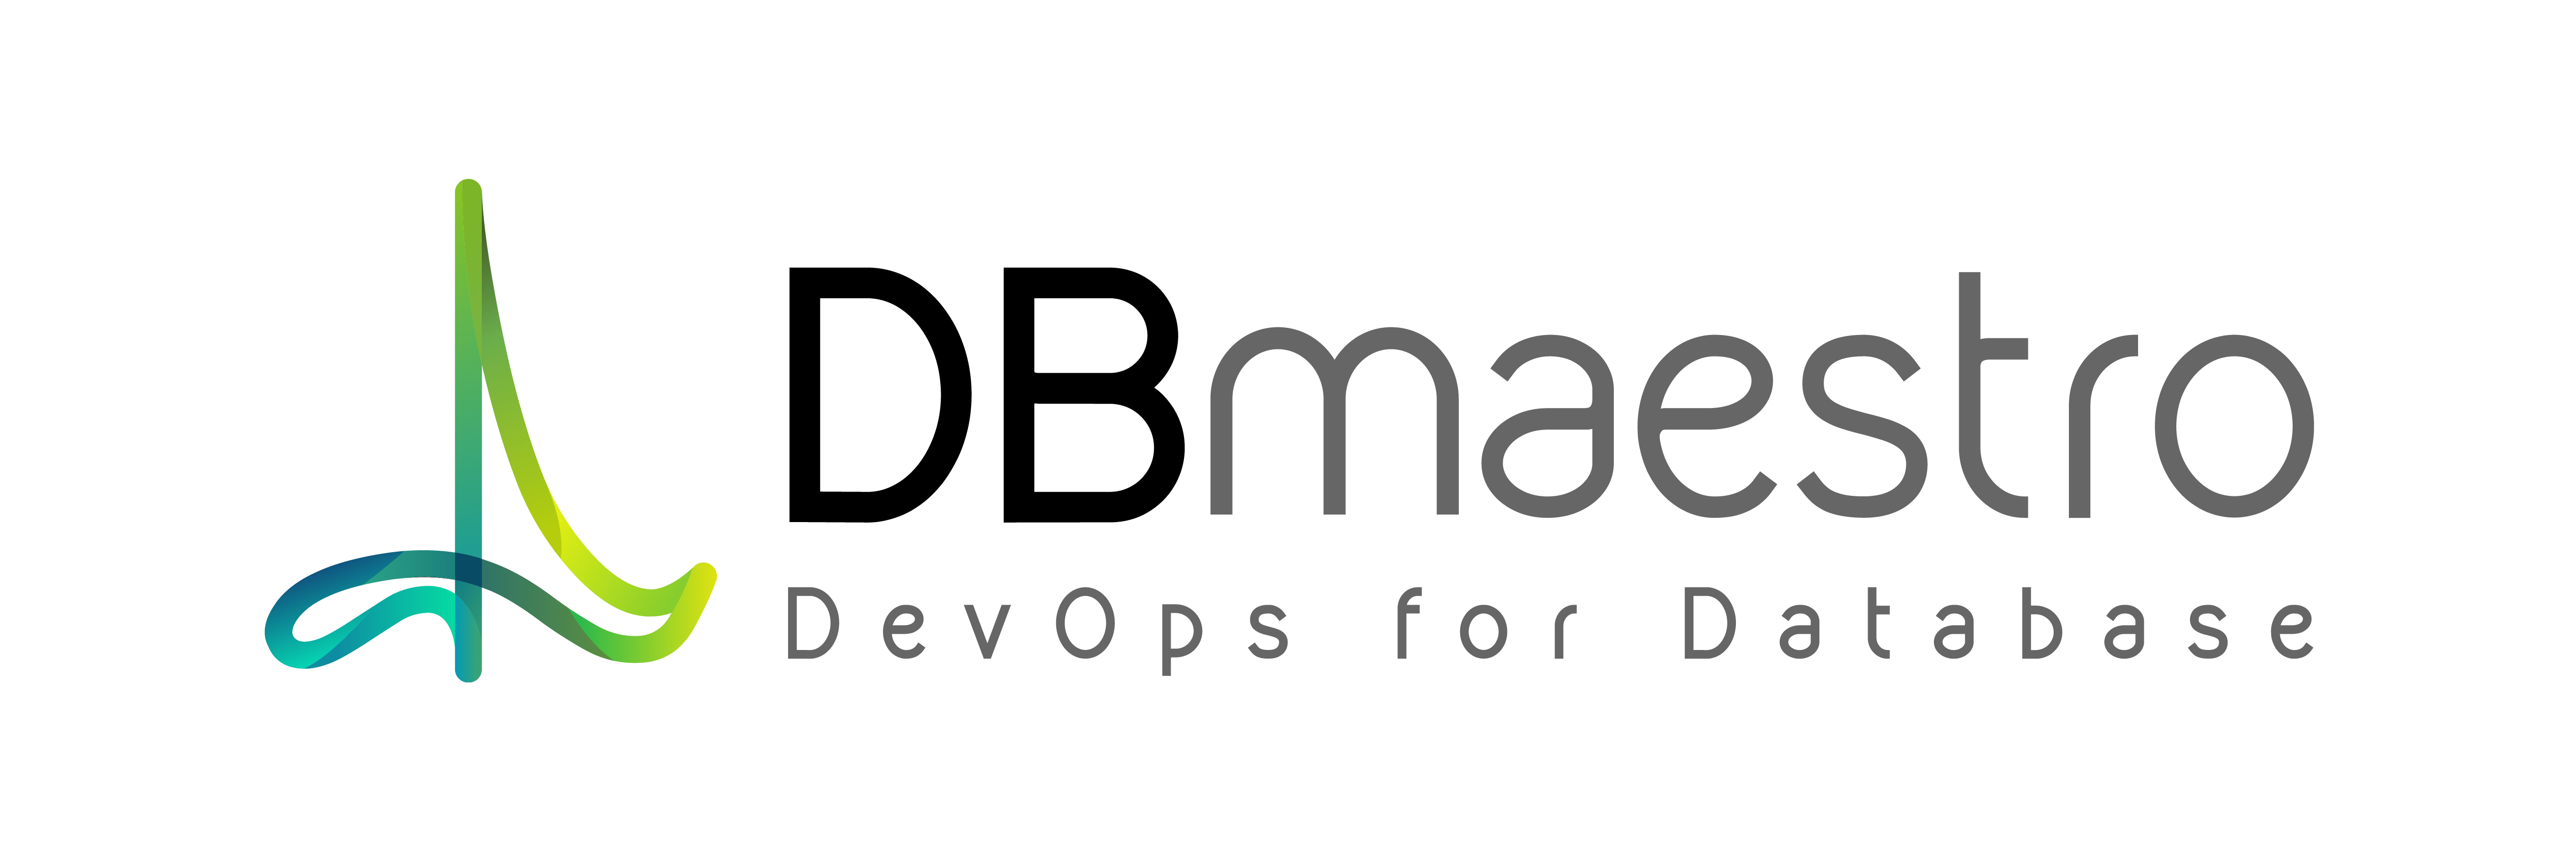 DBmaestro company logo